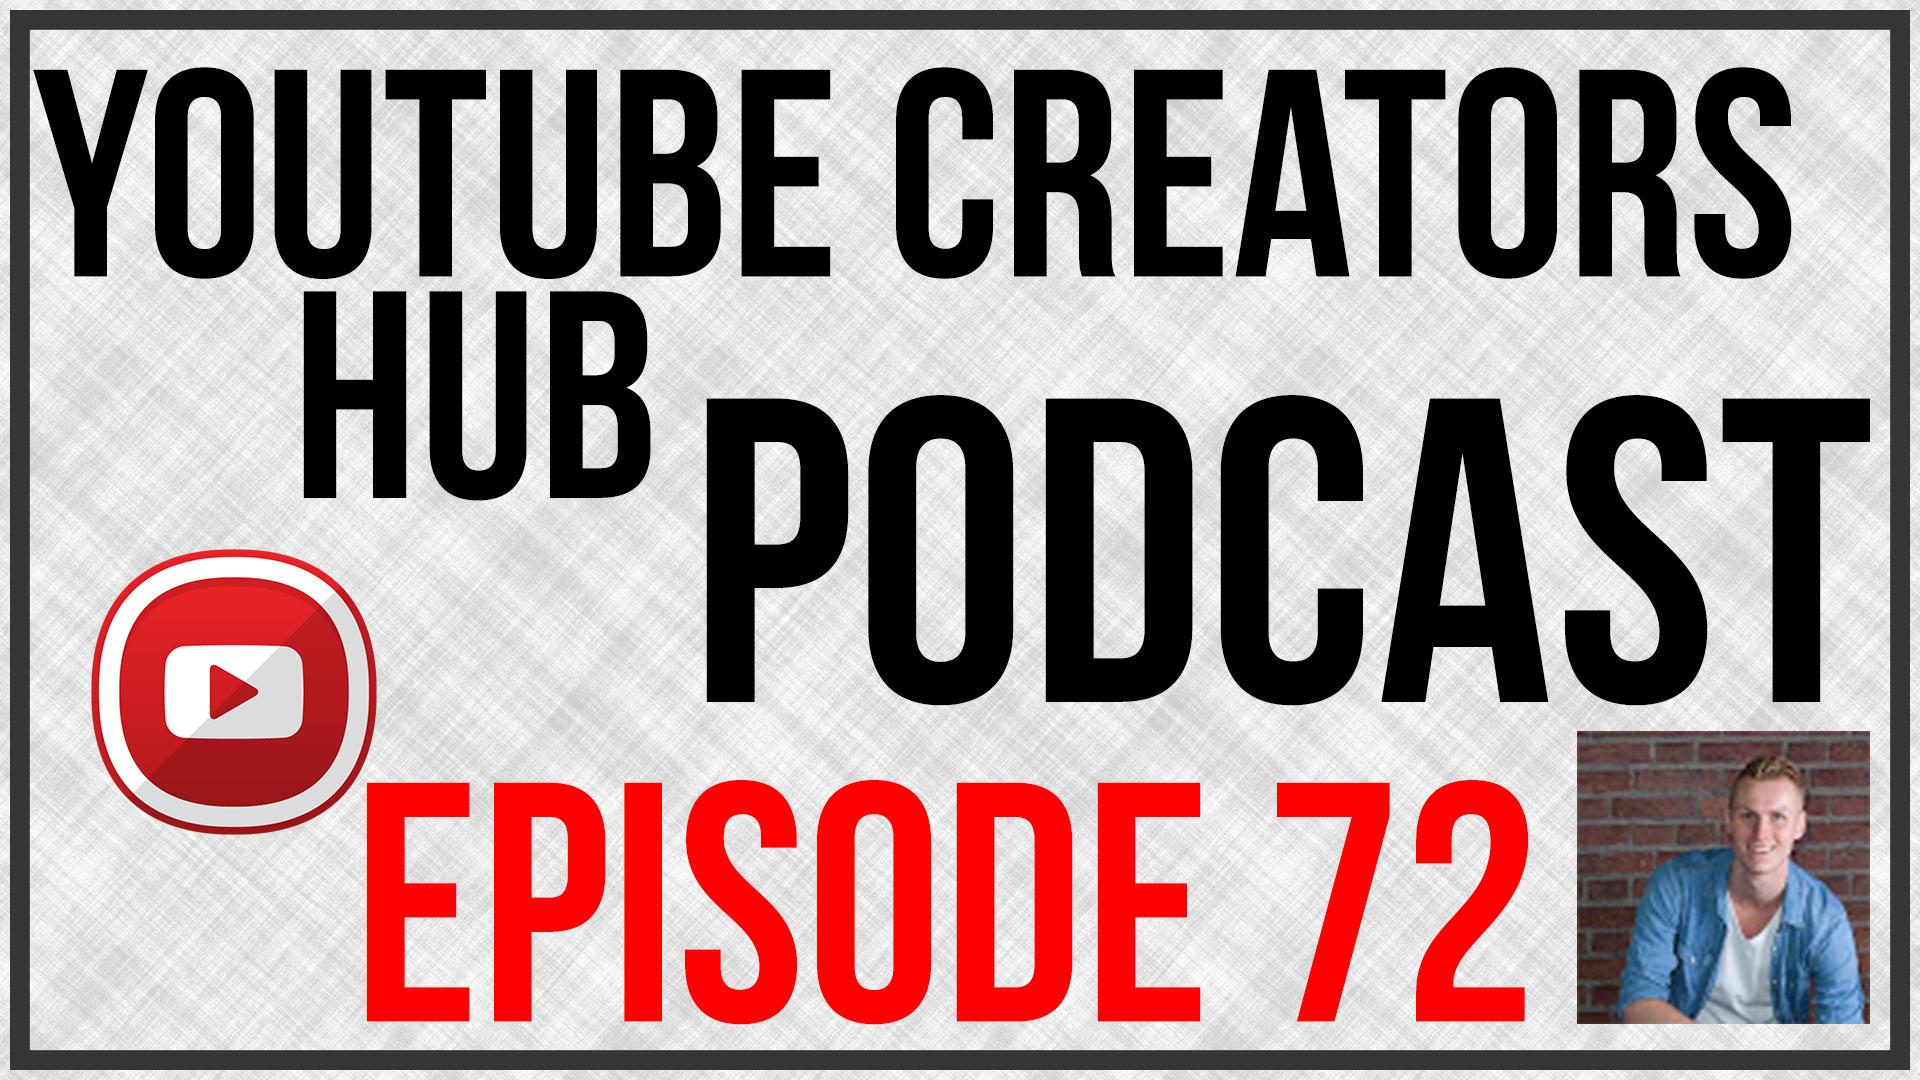 YouTube Creators Hub Podcast Episode 72